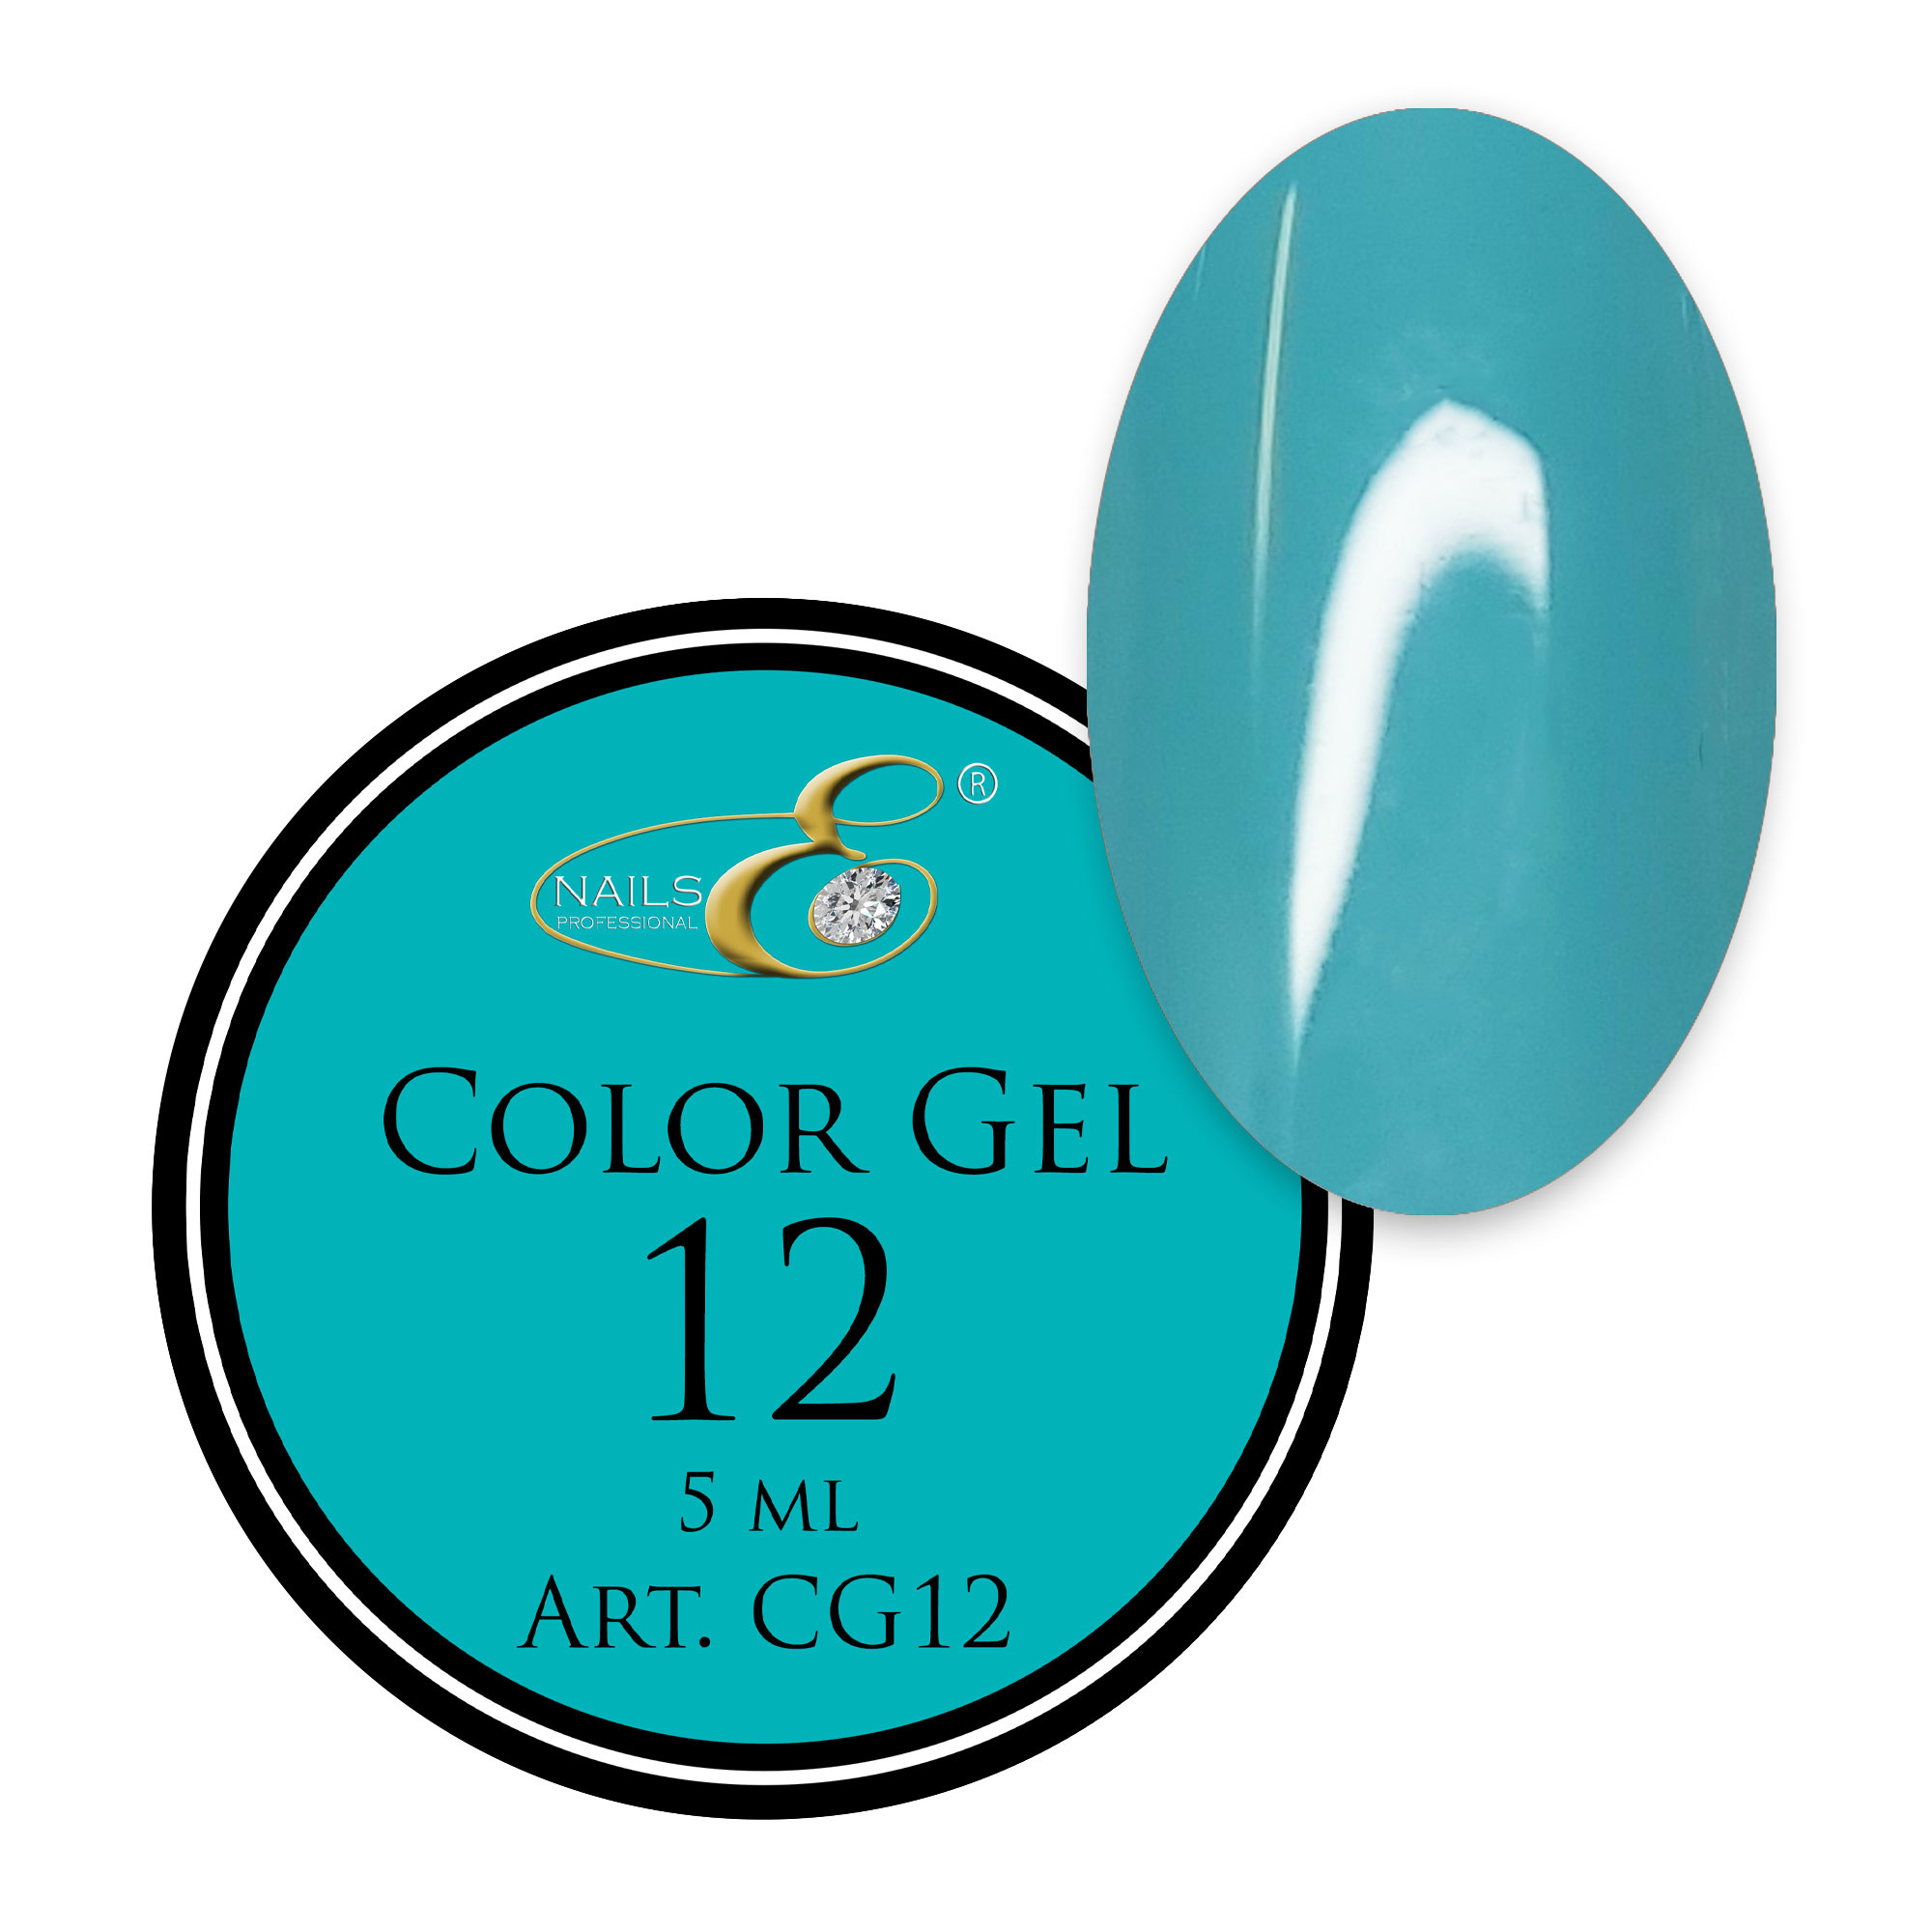 NailsE Professional NailsE Color Gel 12. 5ml